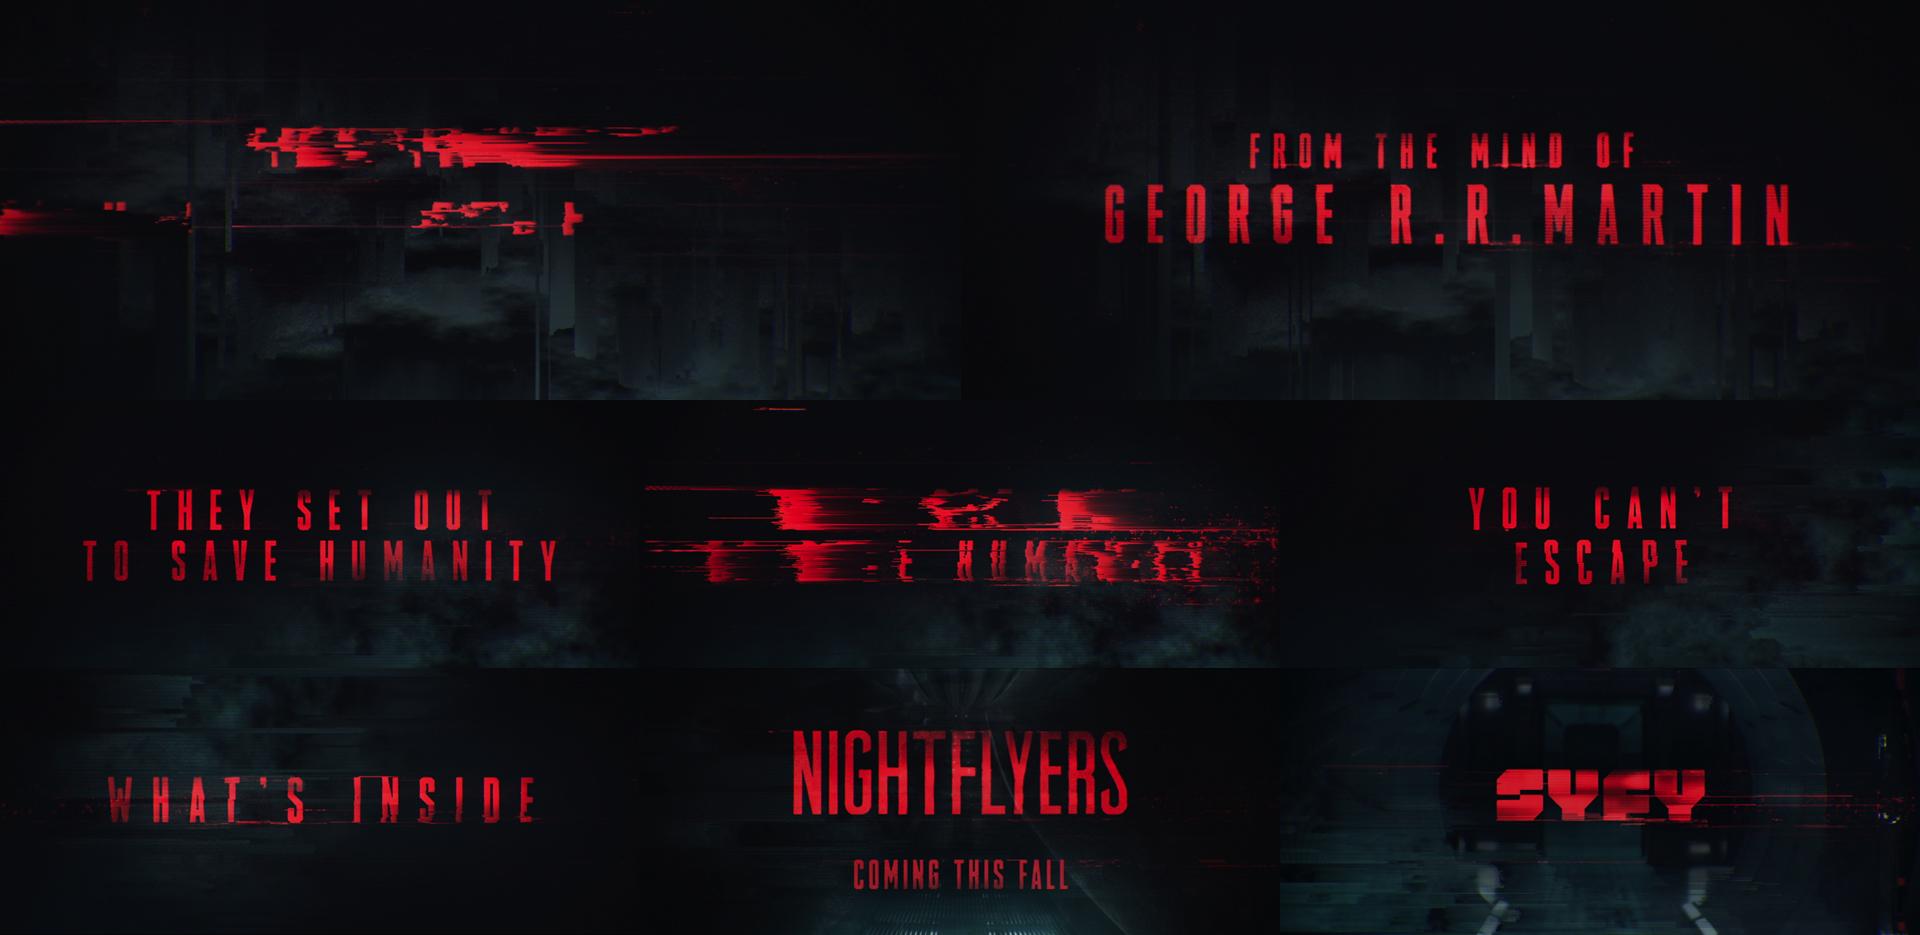 SFY_NightFlyers_PromoPackage_Details_01.jpg